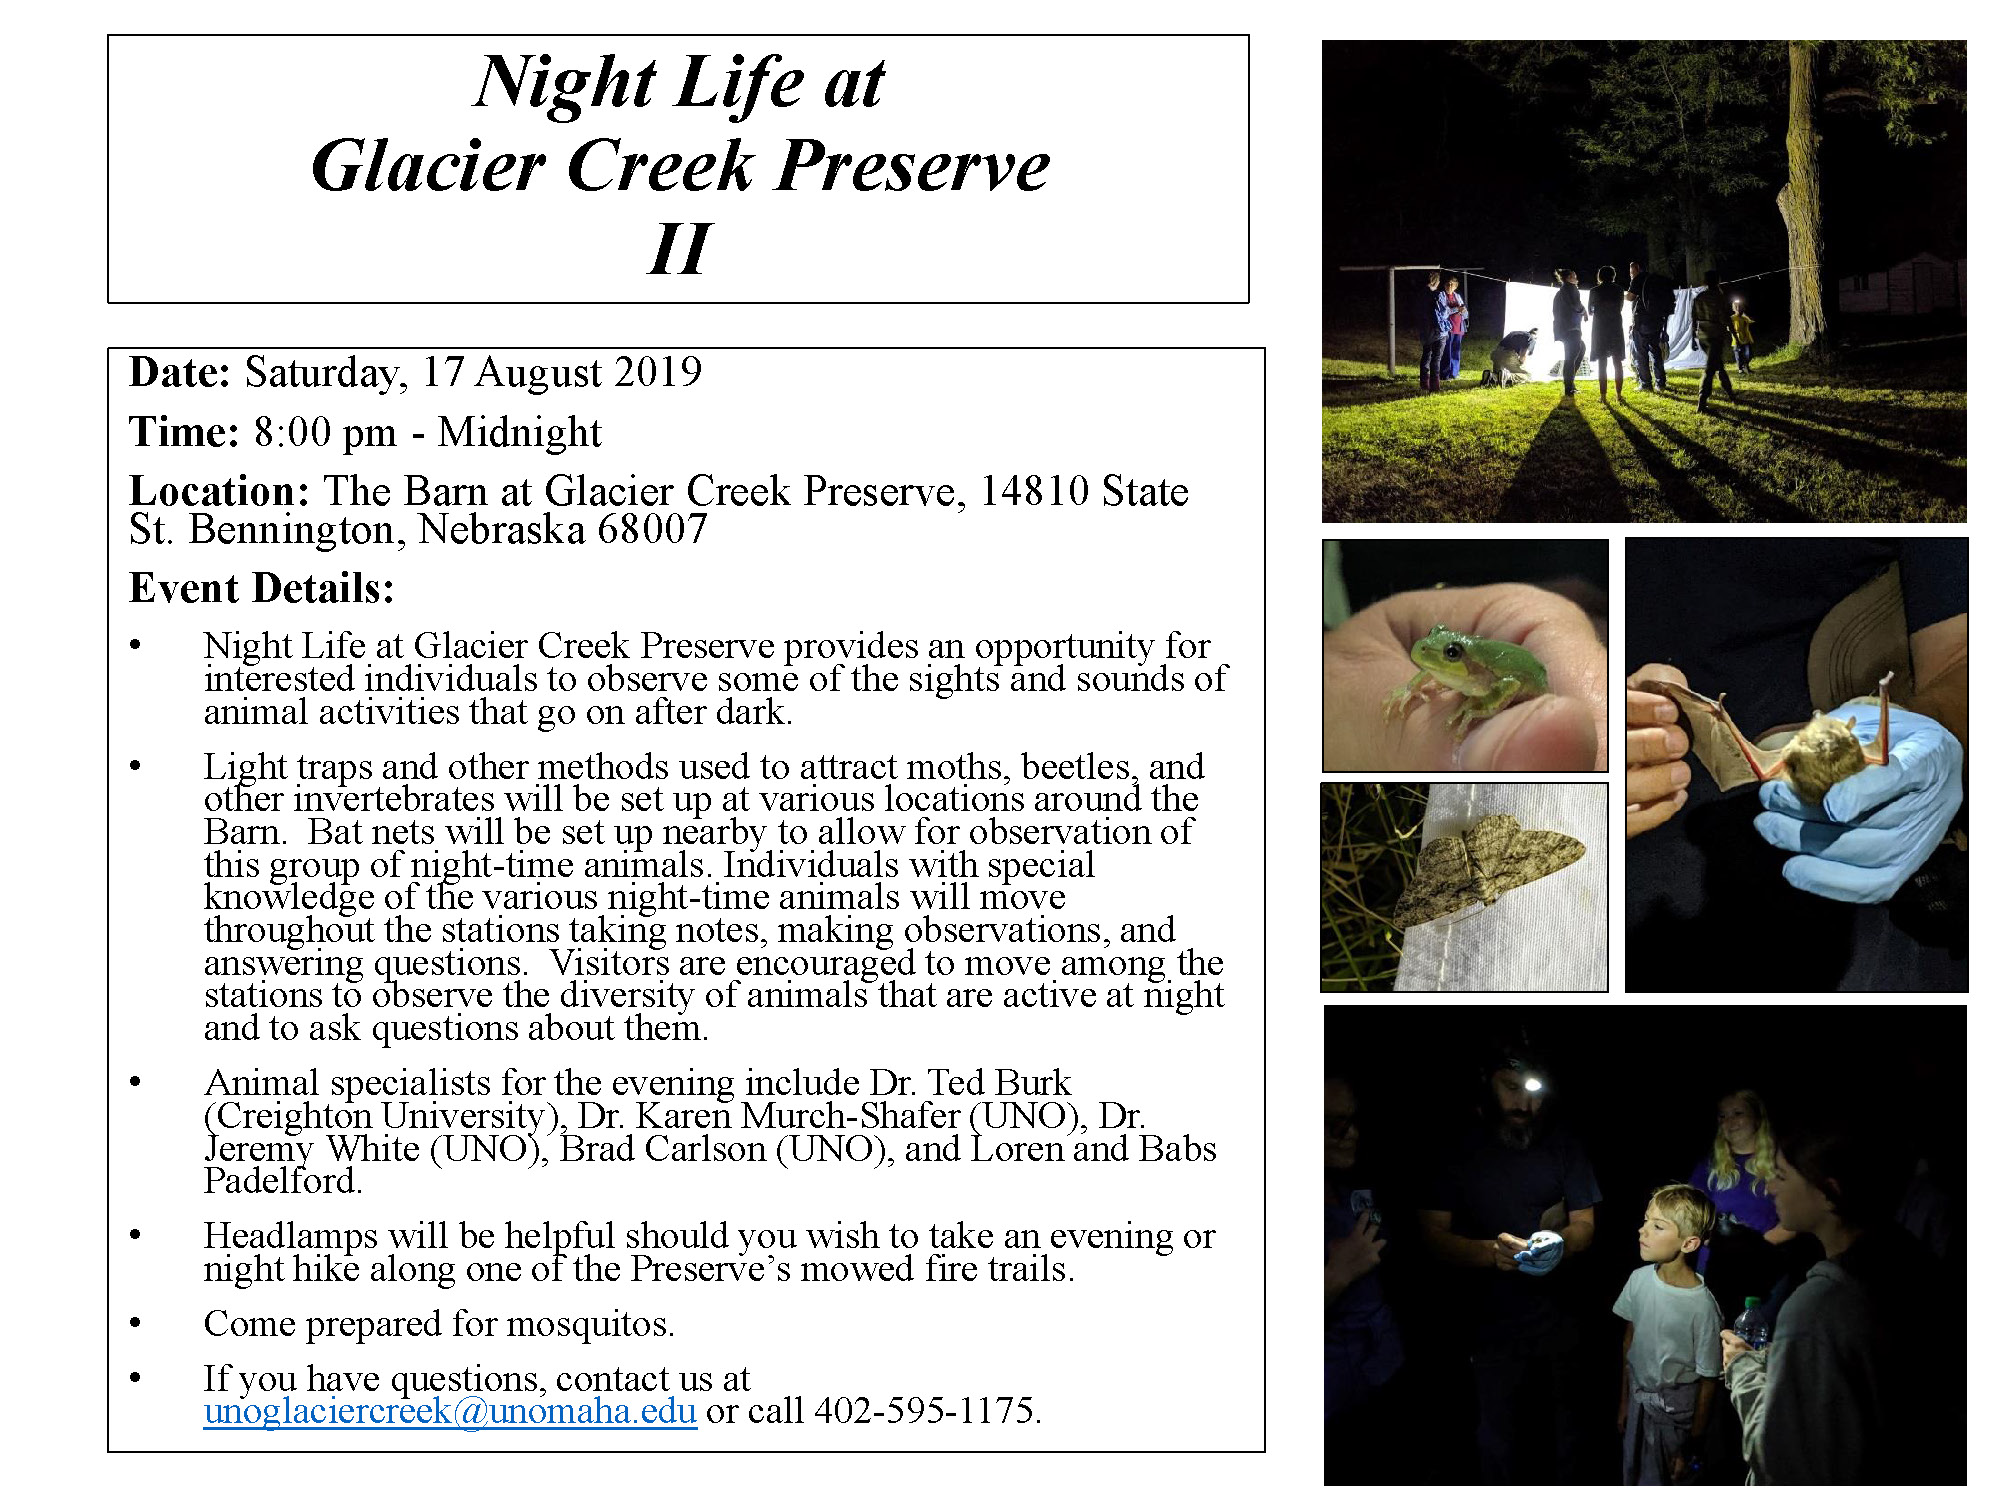 CE: Night Life at Glacier Creek Preserve